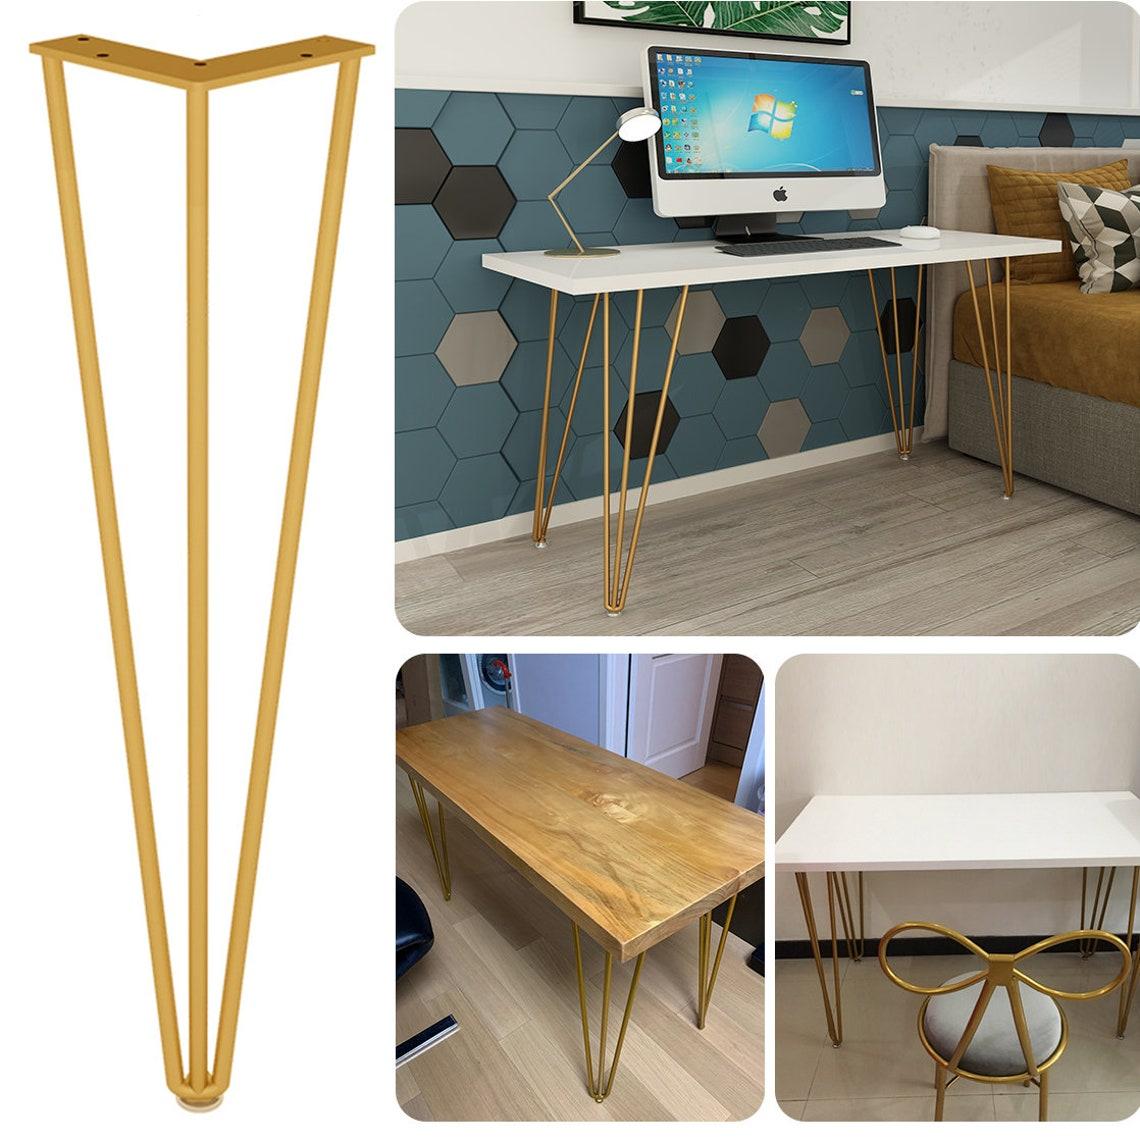 Dine  Bar Metal Table Legs  Iron Room Furniture Dine Leg 4pcs Gambe Tavolo Ferro Pata Mesa Custom table legs